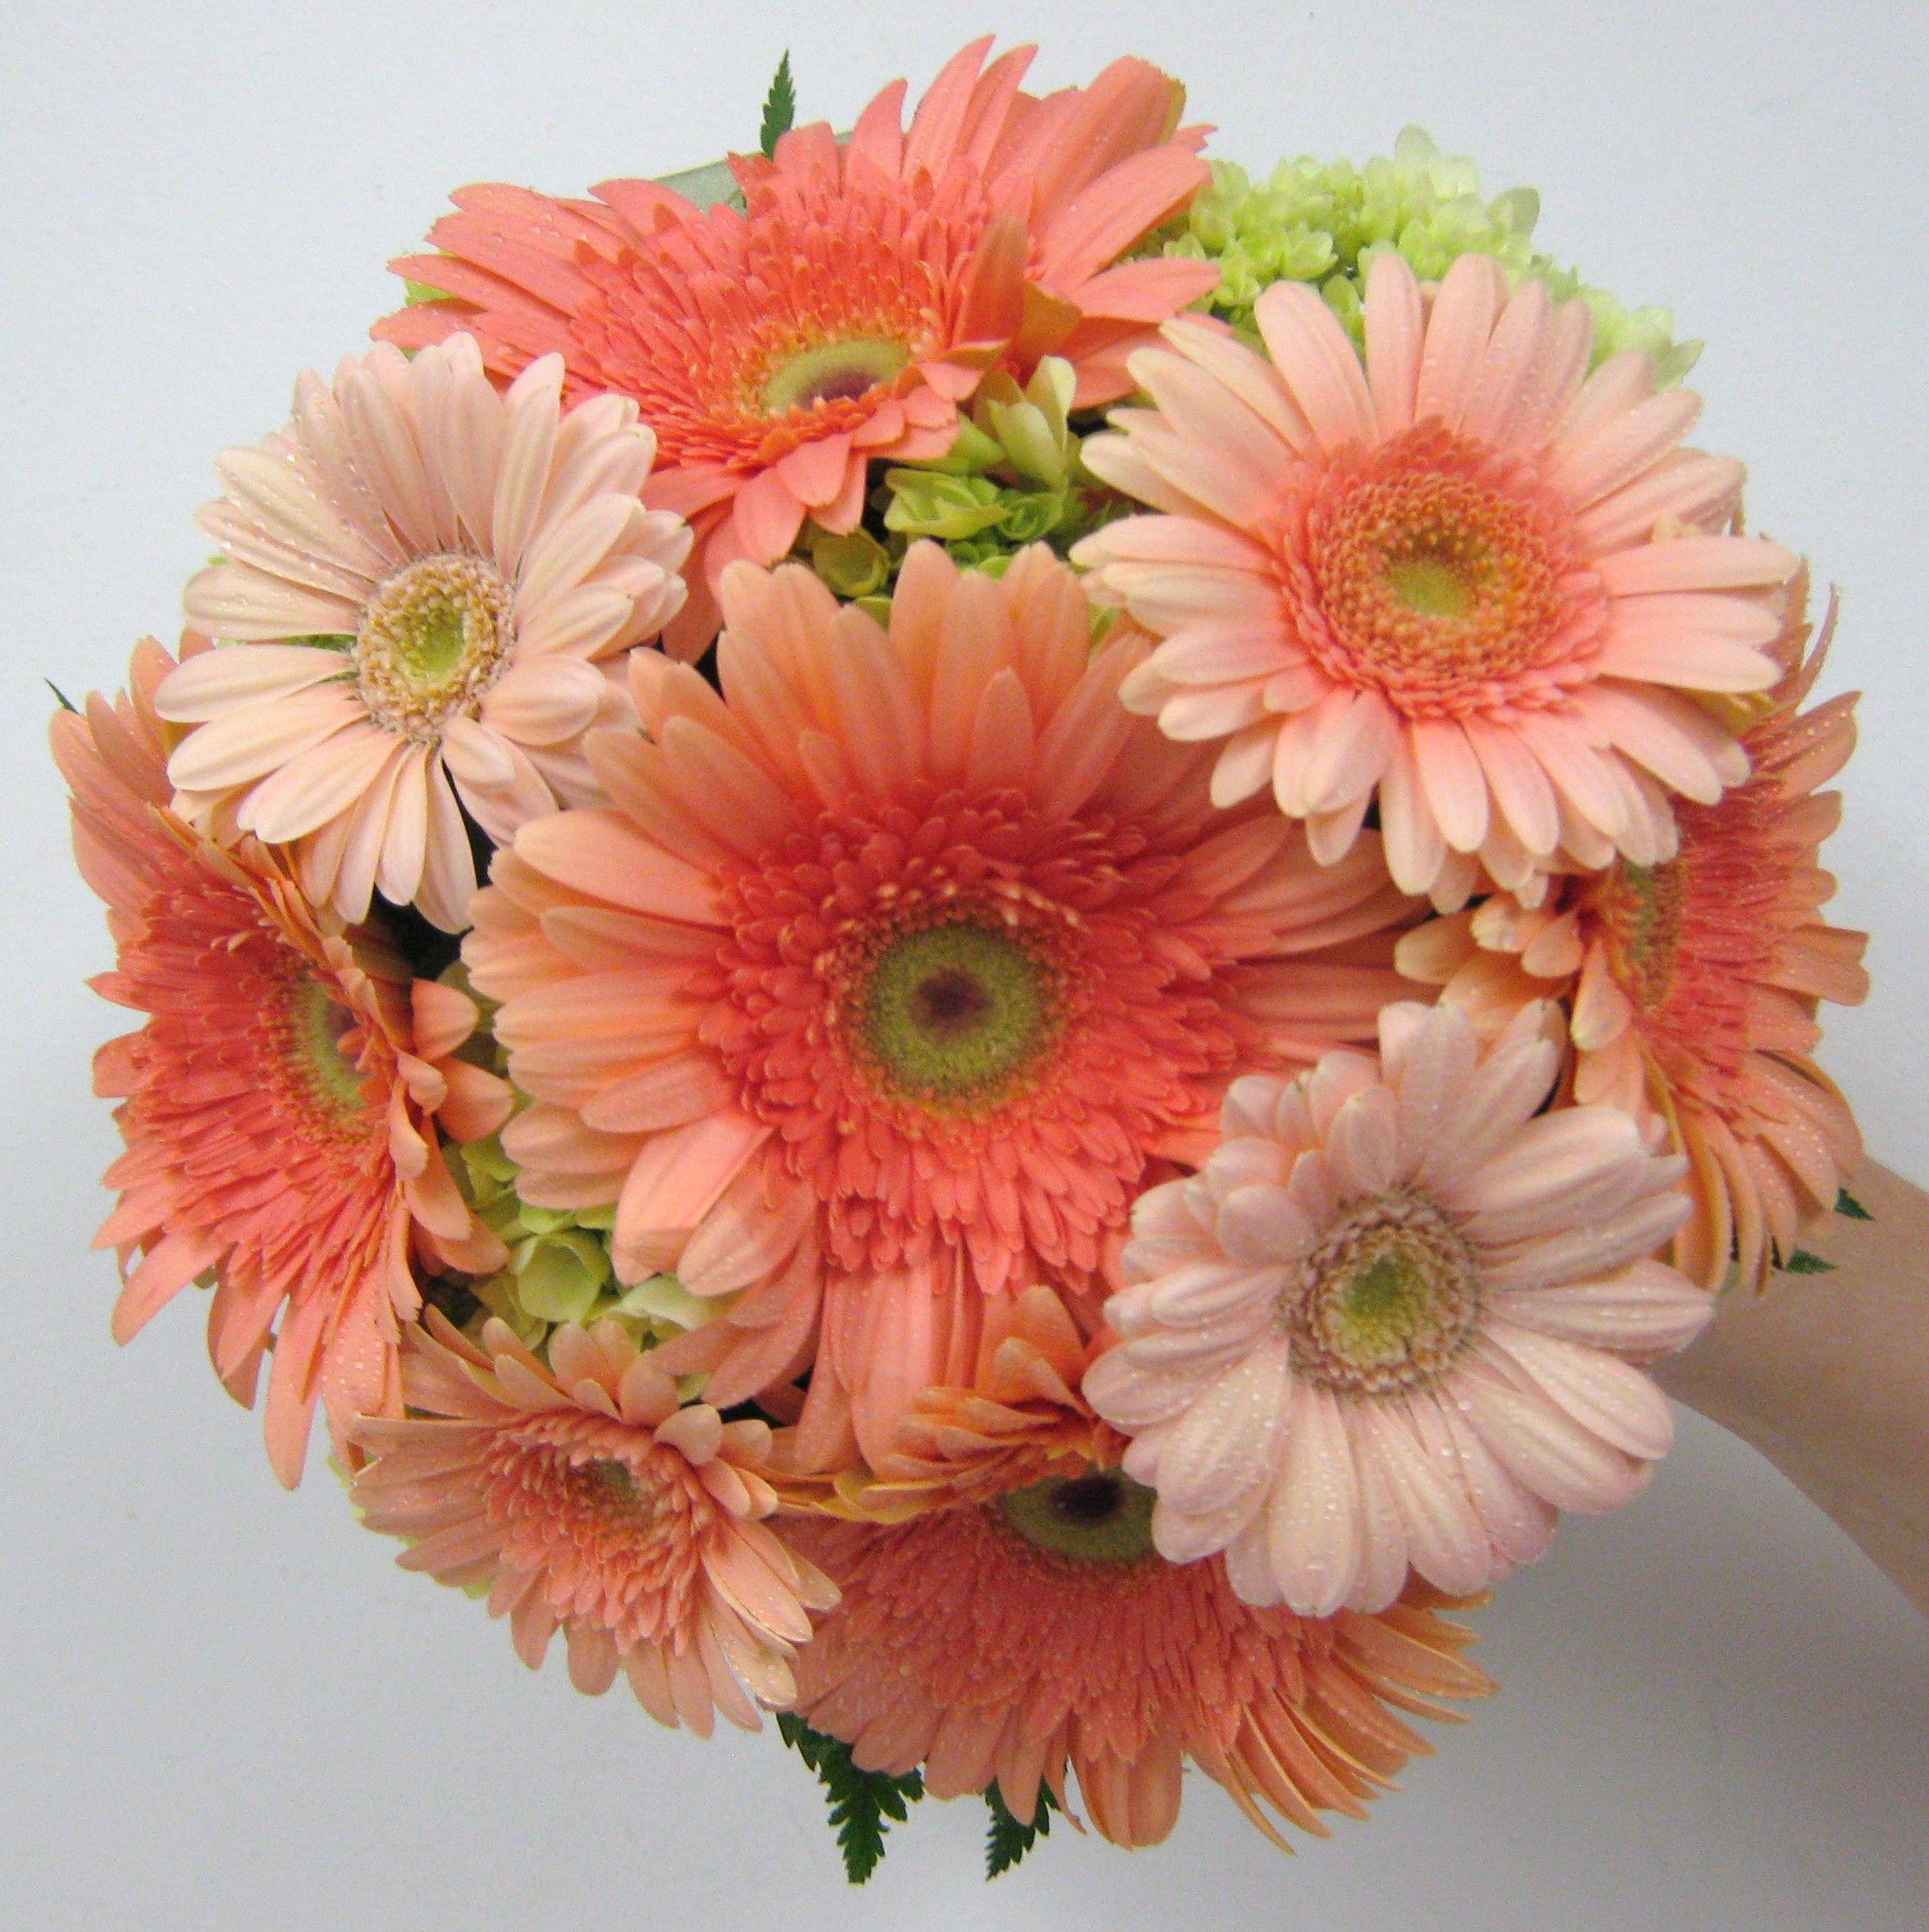 ... Peach. The Bridesmaids Carried